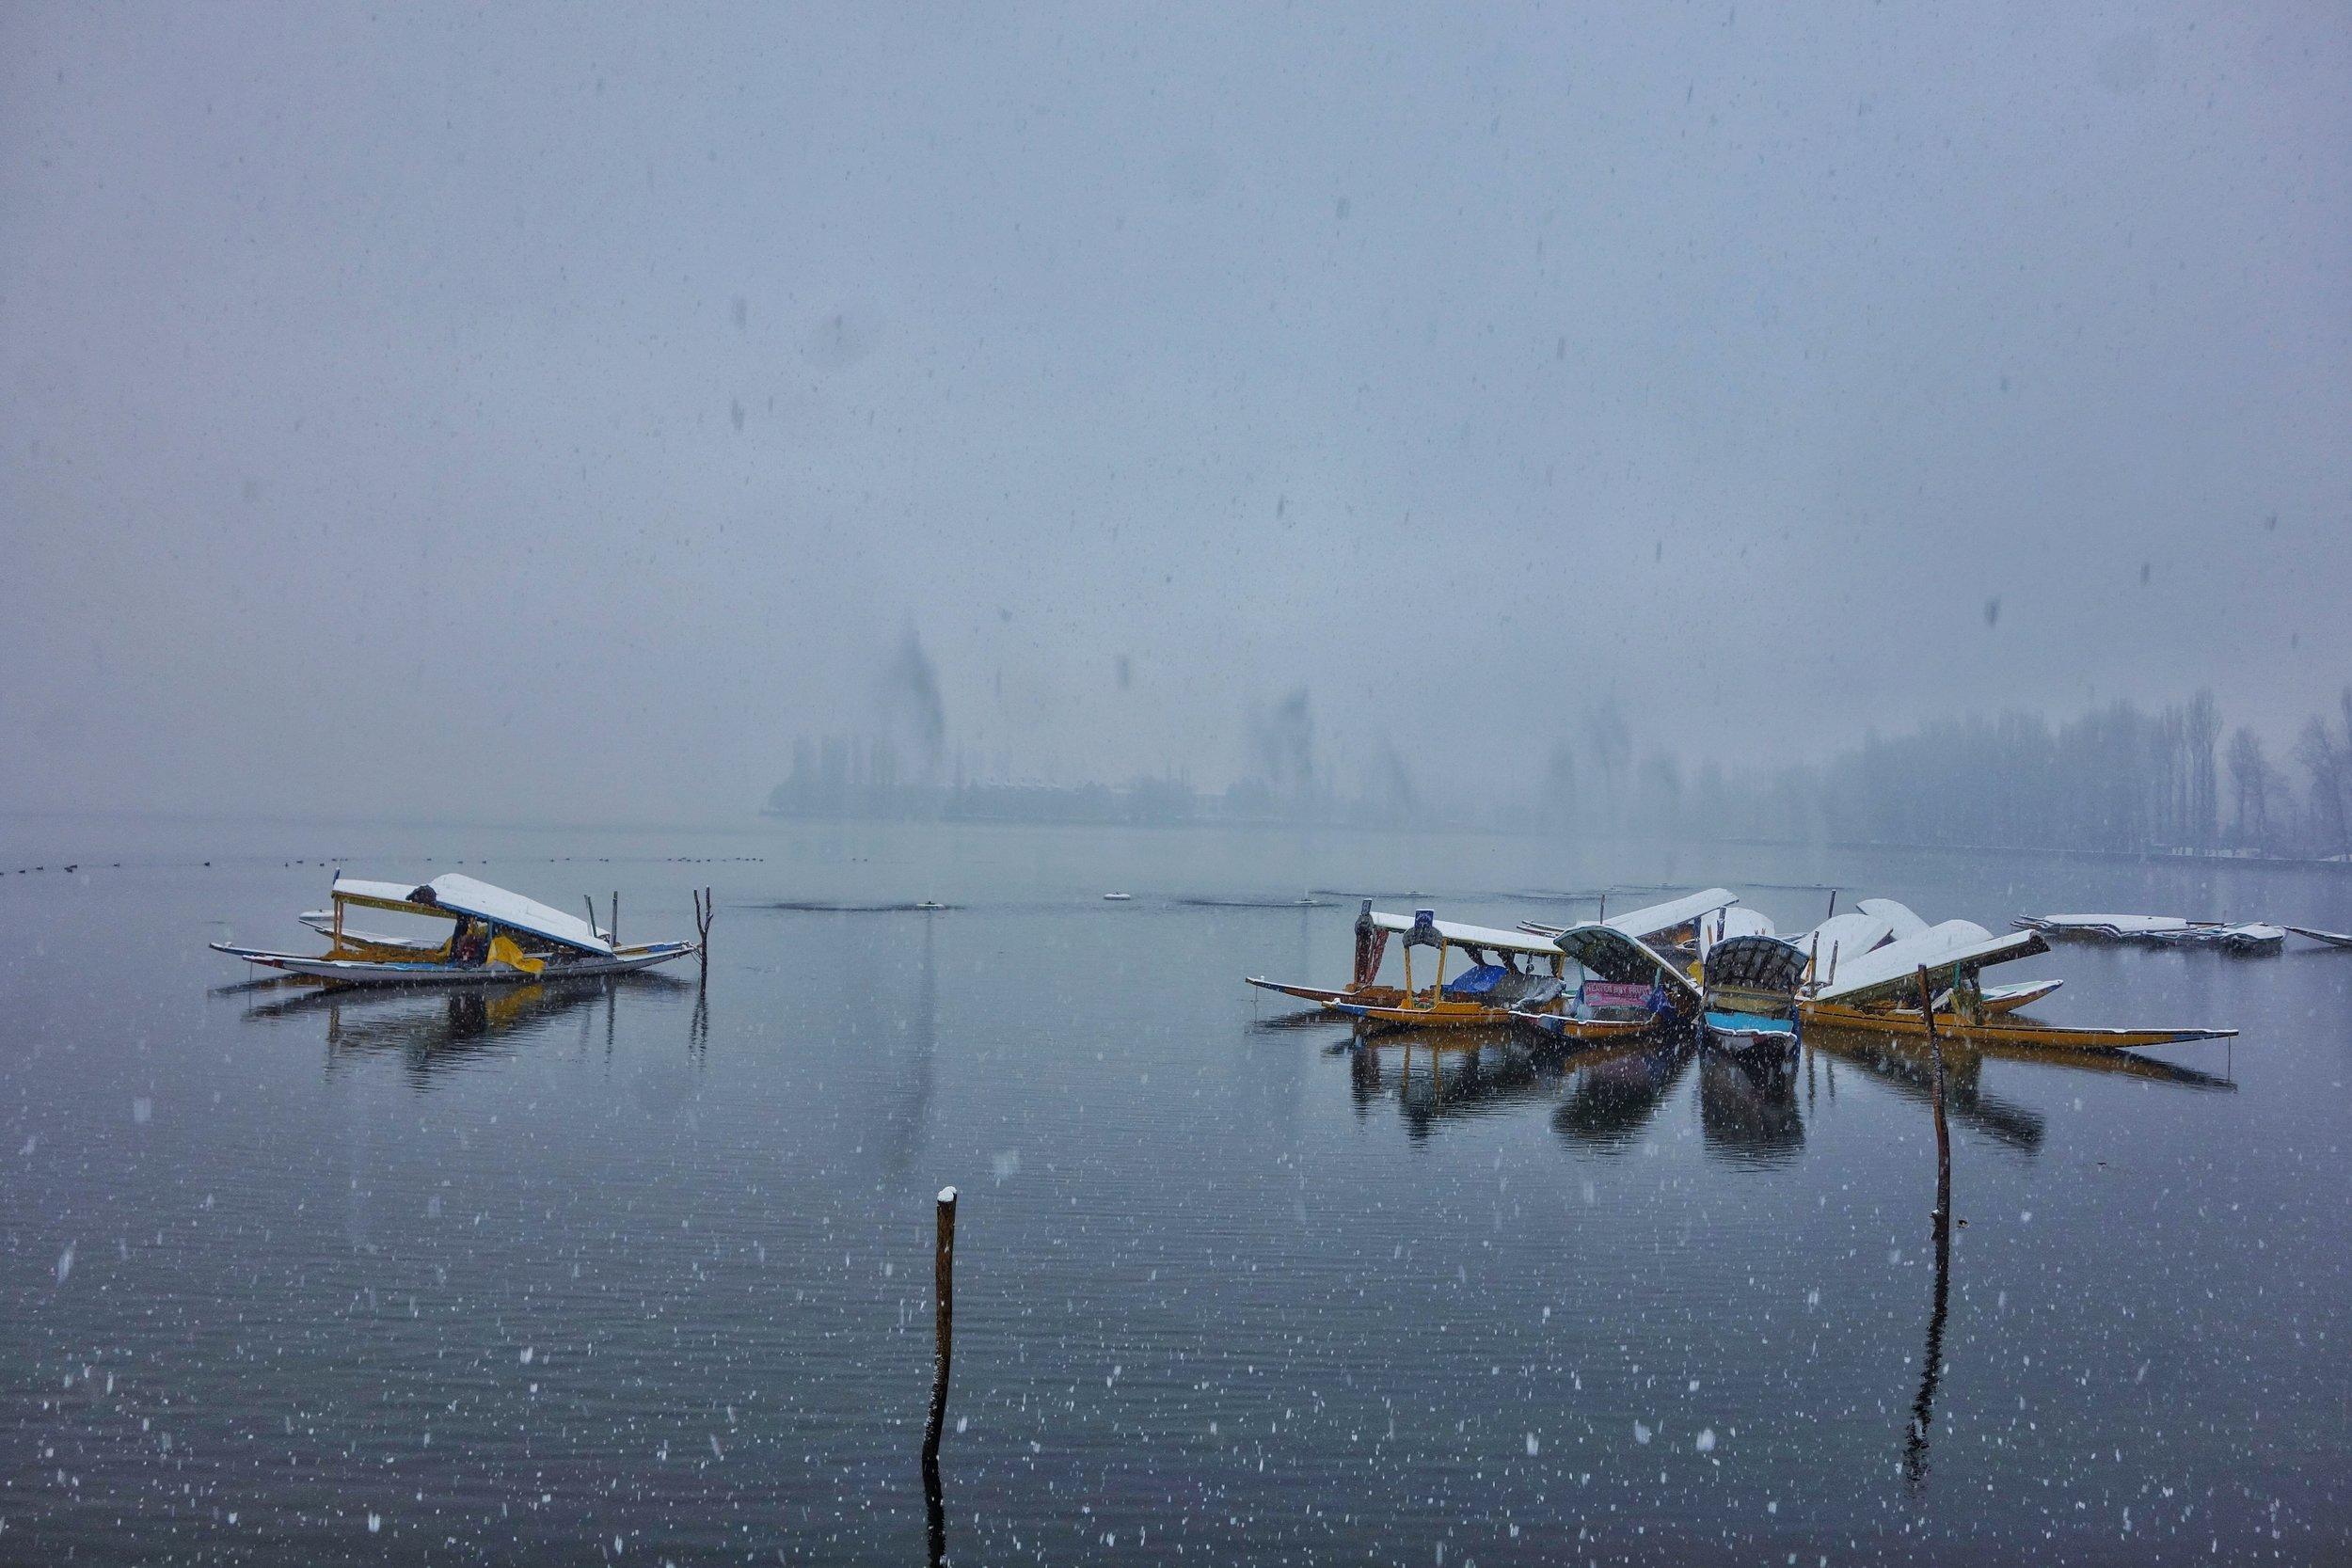 snowfall-dallake-srinagar-kashmir